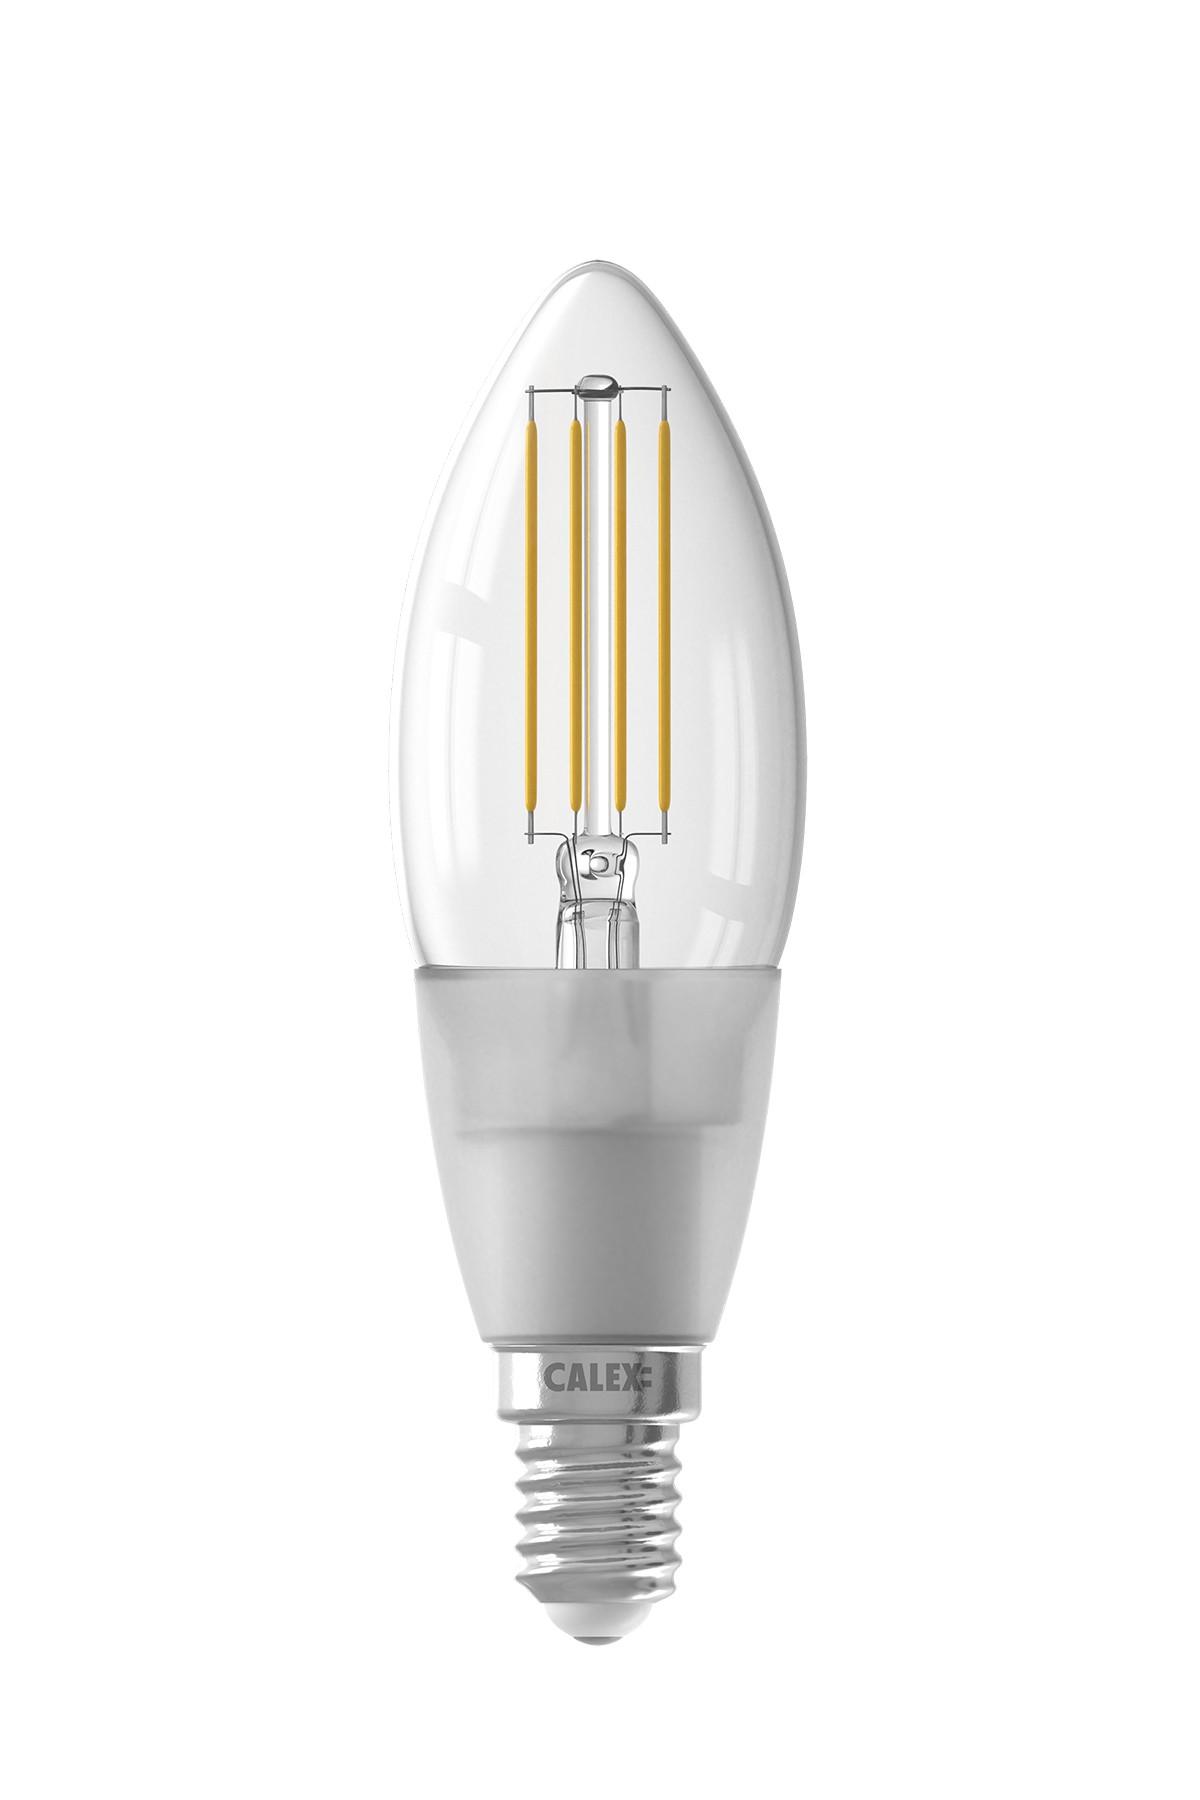 Calex Smart Kaars led lamp 4,5W 450lm 1800-3000K